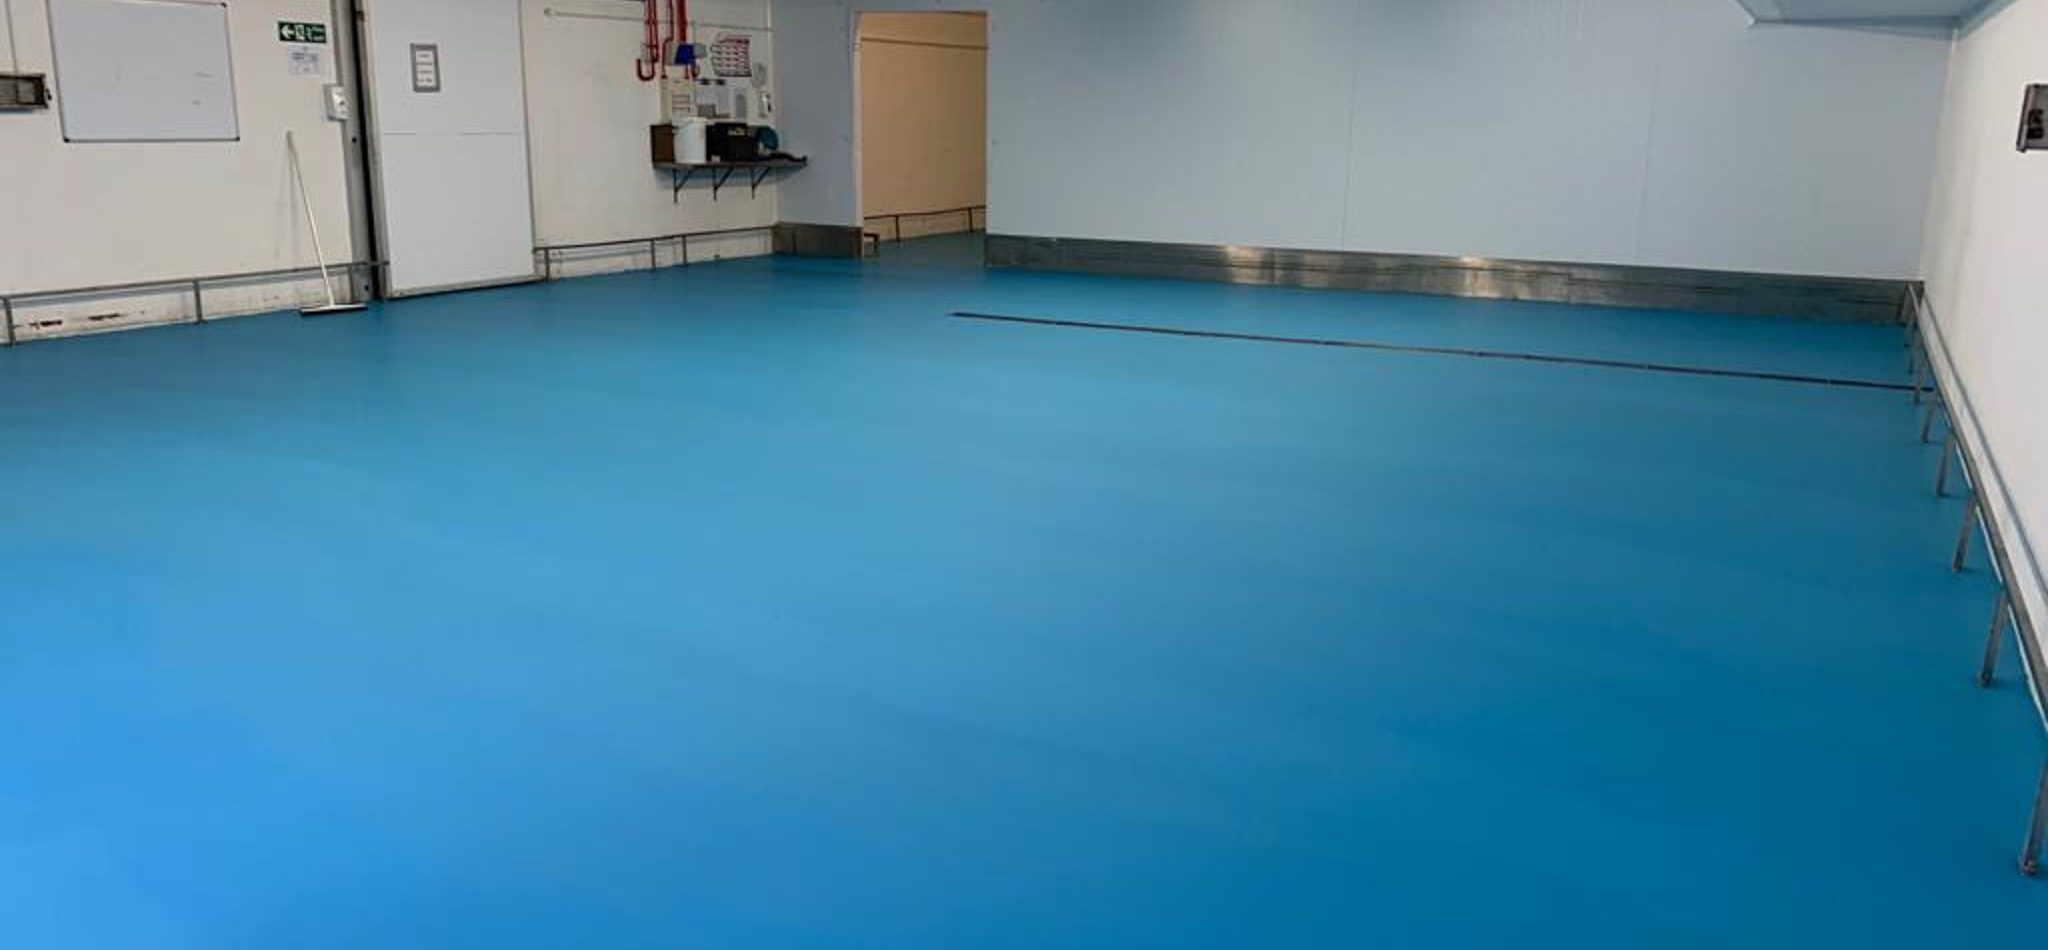 Vebro Polymers - vebrocrete MF at PD Hook (Hatcheries) - Veitchi Flooring